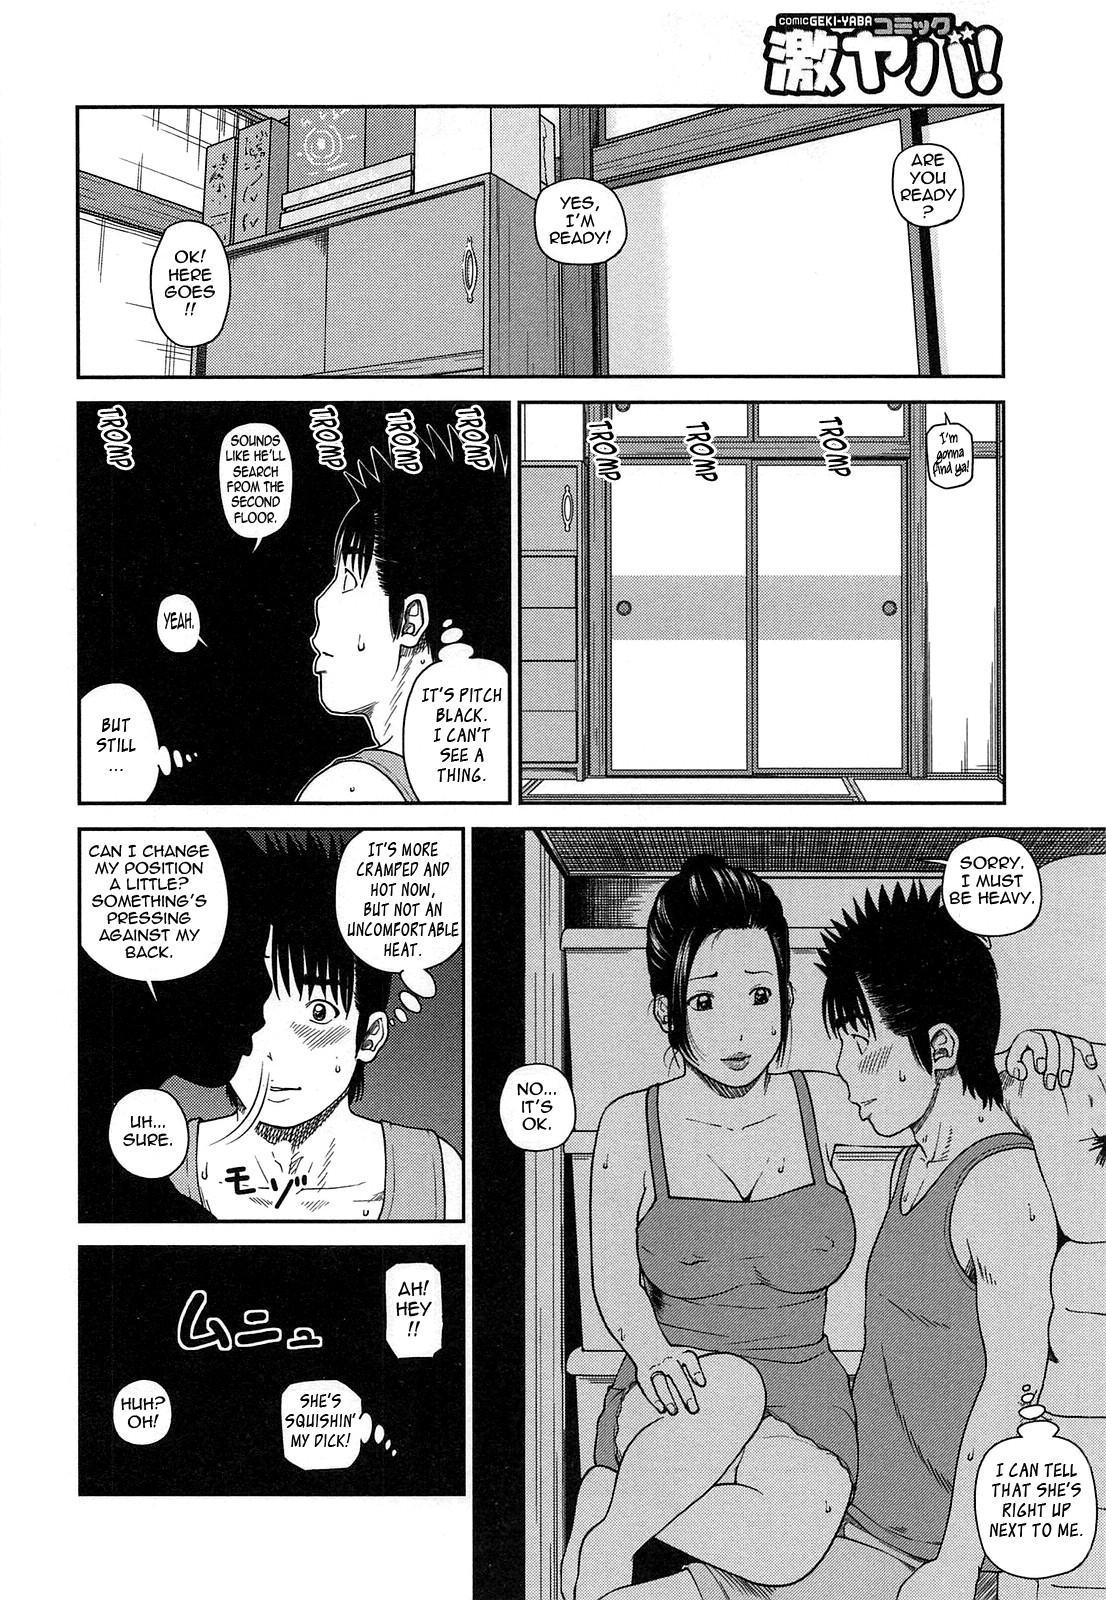 [Kuroki Hidehiko] 35 Sai Yarigoro Zuma | 35-Year-Old Ripe Wife [English] {Tadanohito} [Decensored] 182